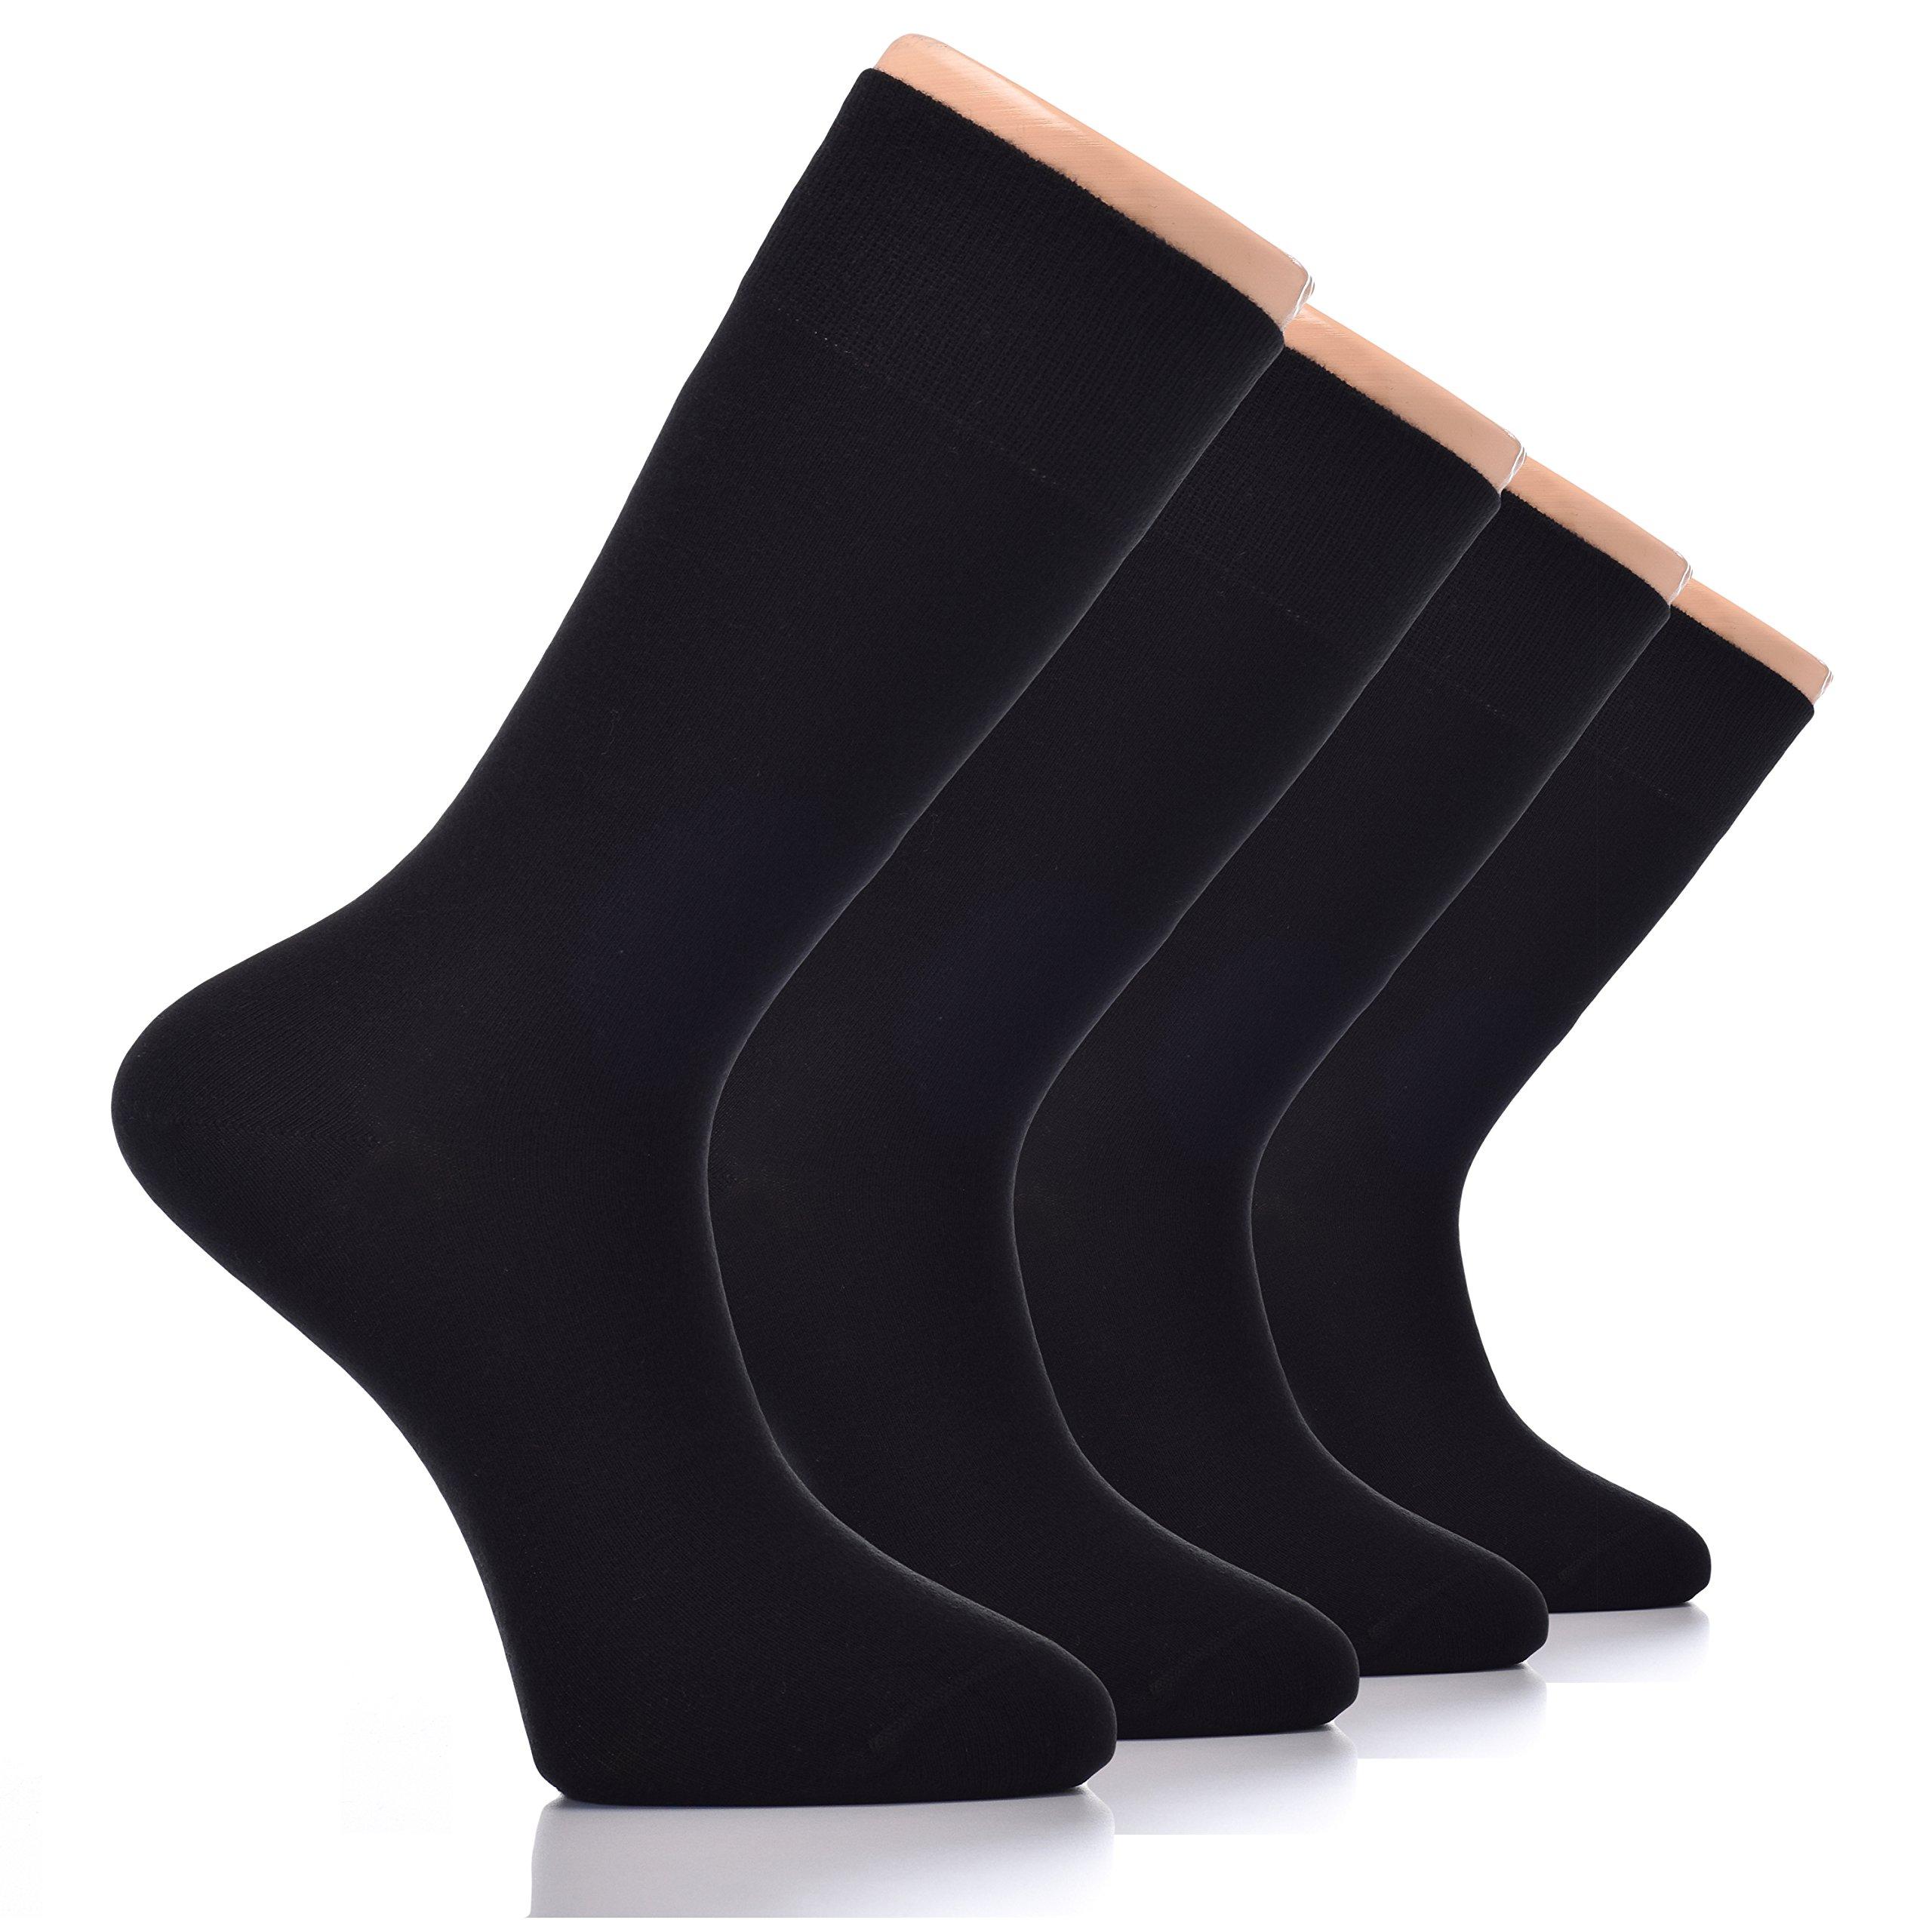 HUGH UGOLI Men's Dress Crew Socks Seamless BAMBOO Business Casual 4 Pairs(Black)